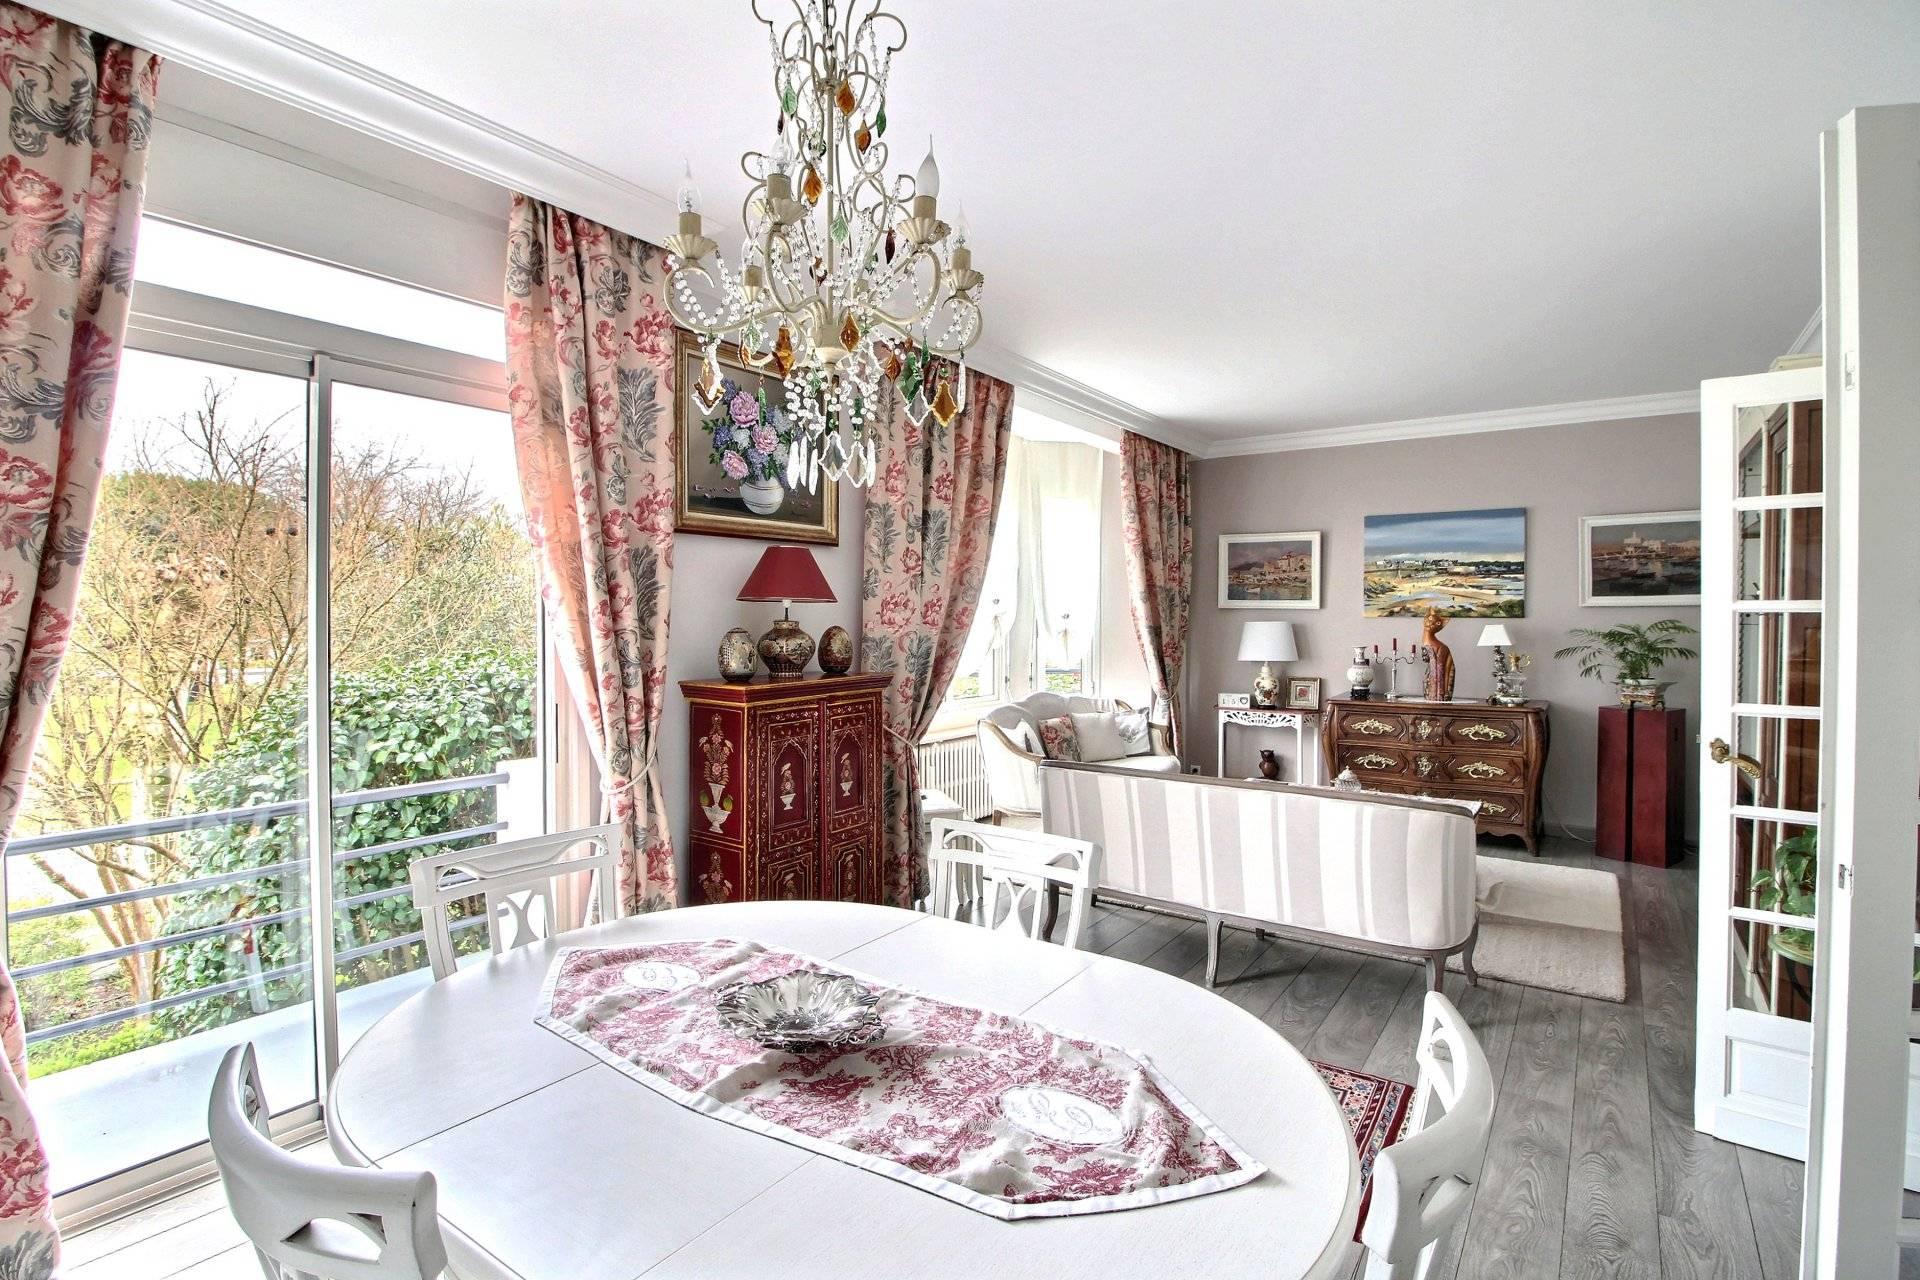 Acheter charmante maison normande familiale VILLENAVE D'ORNON